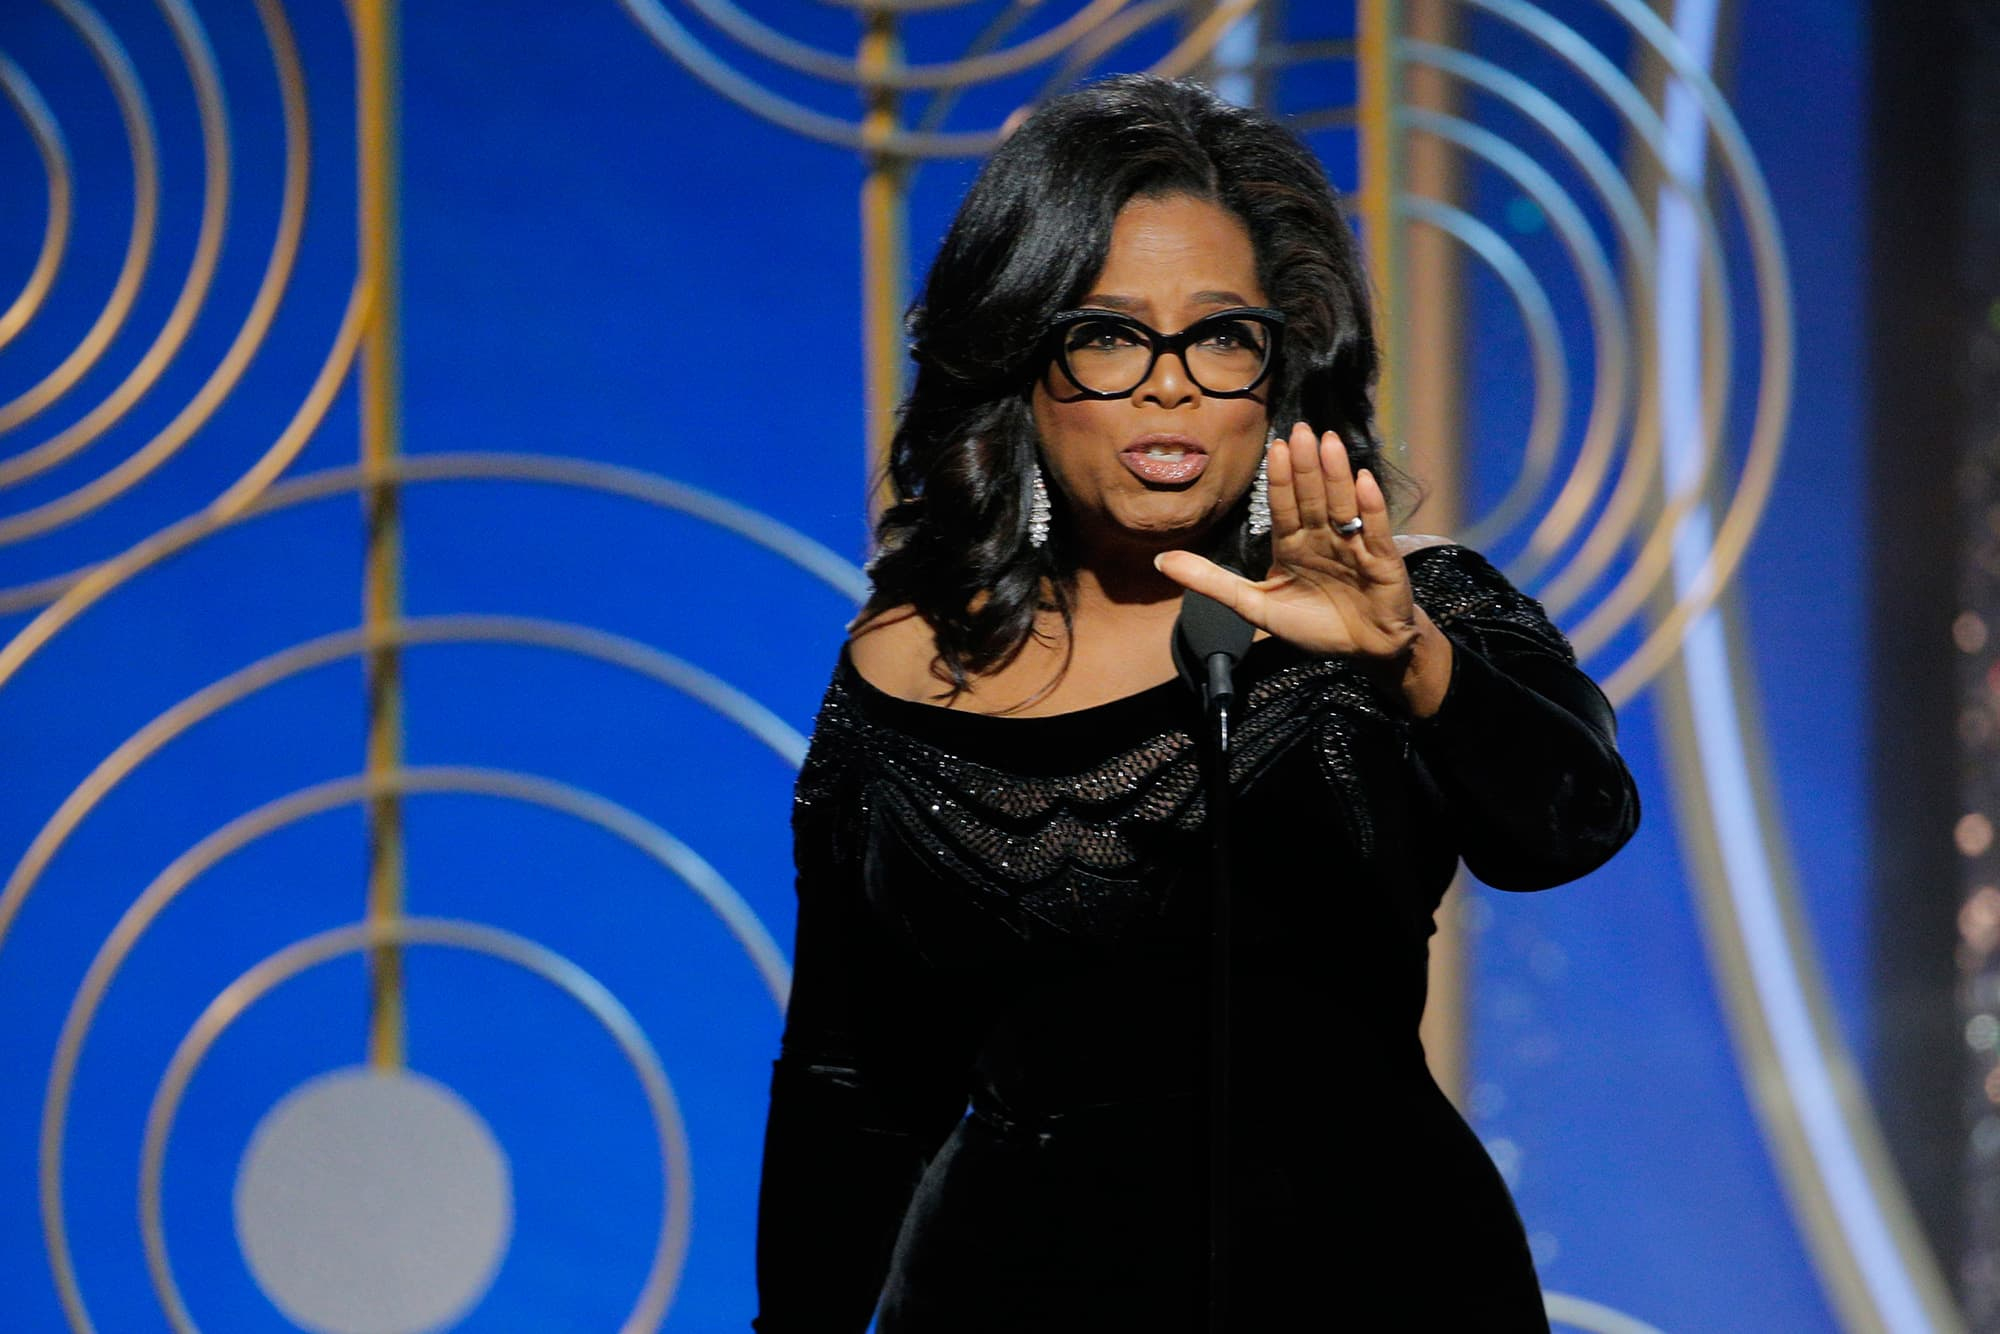 Oprah Winfrey online dating Gratis online dating chating